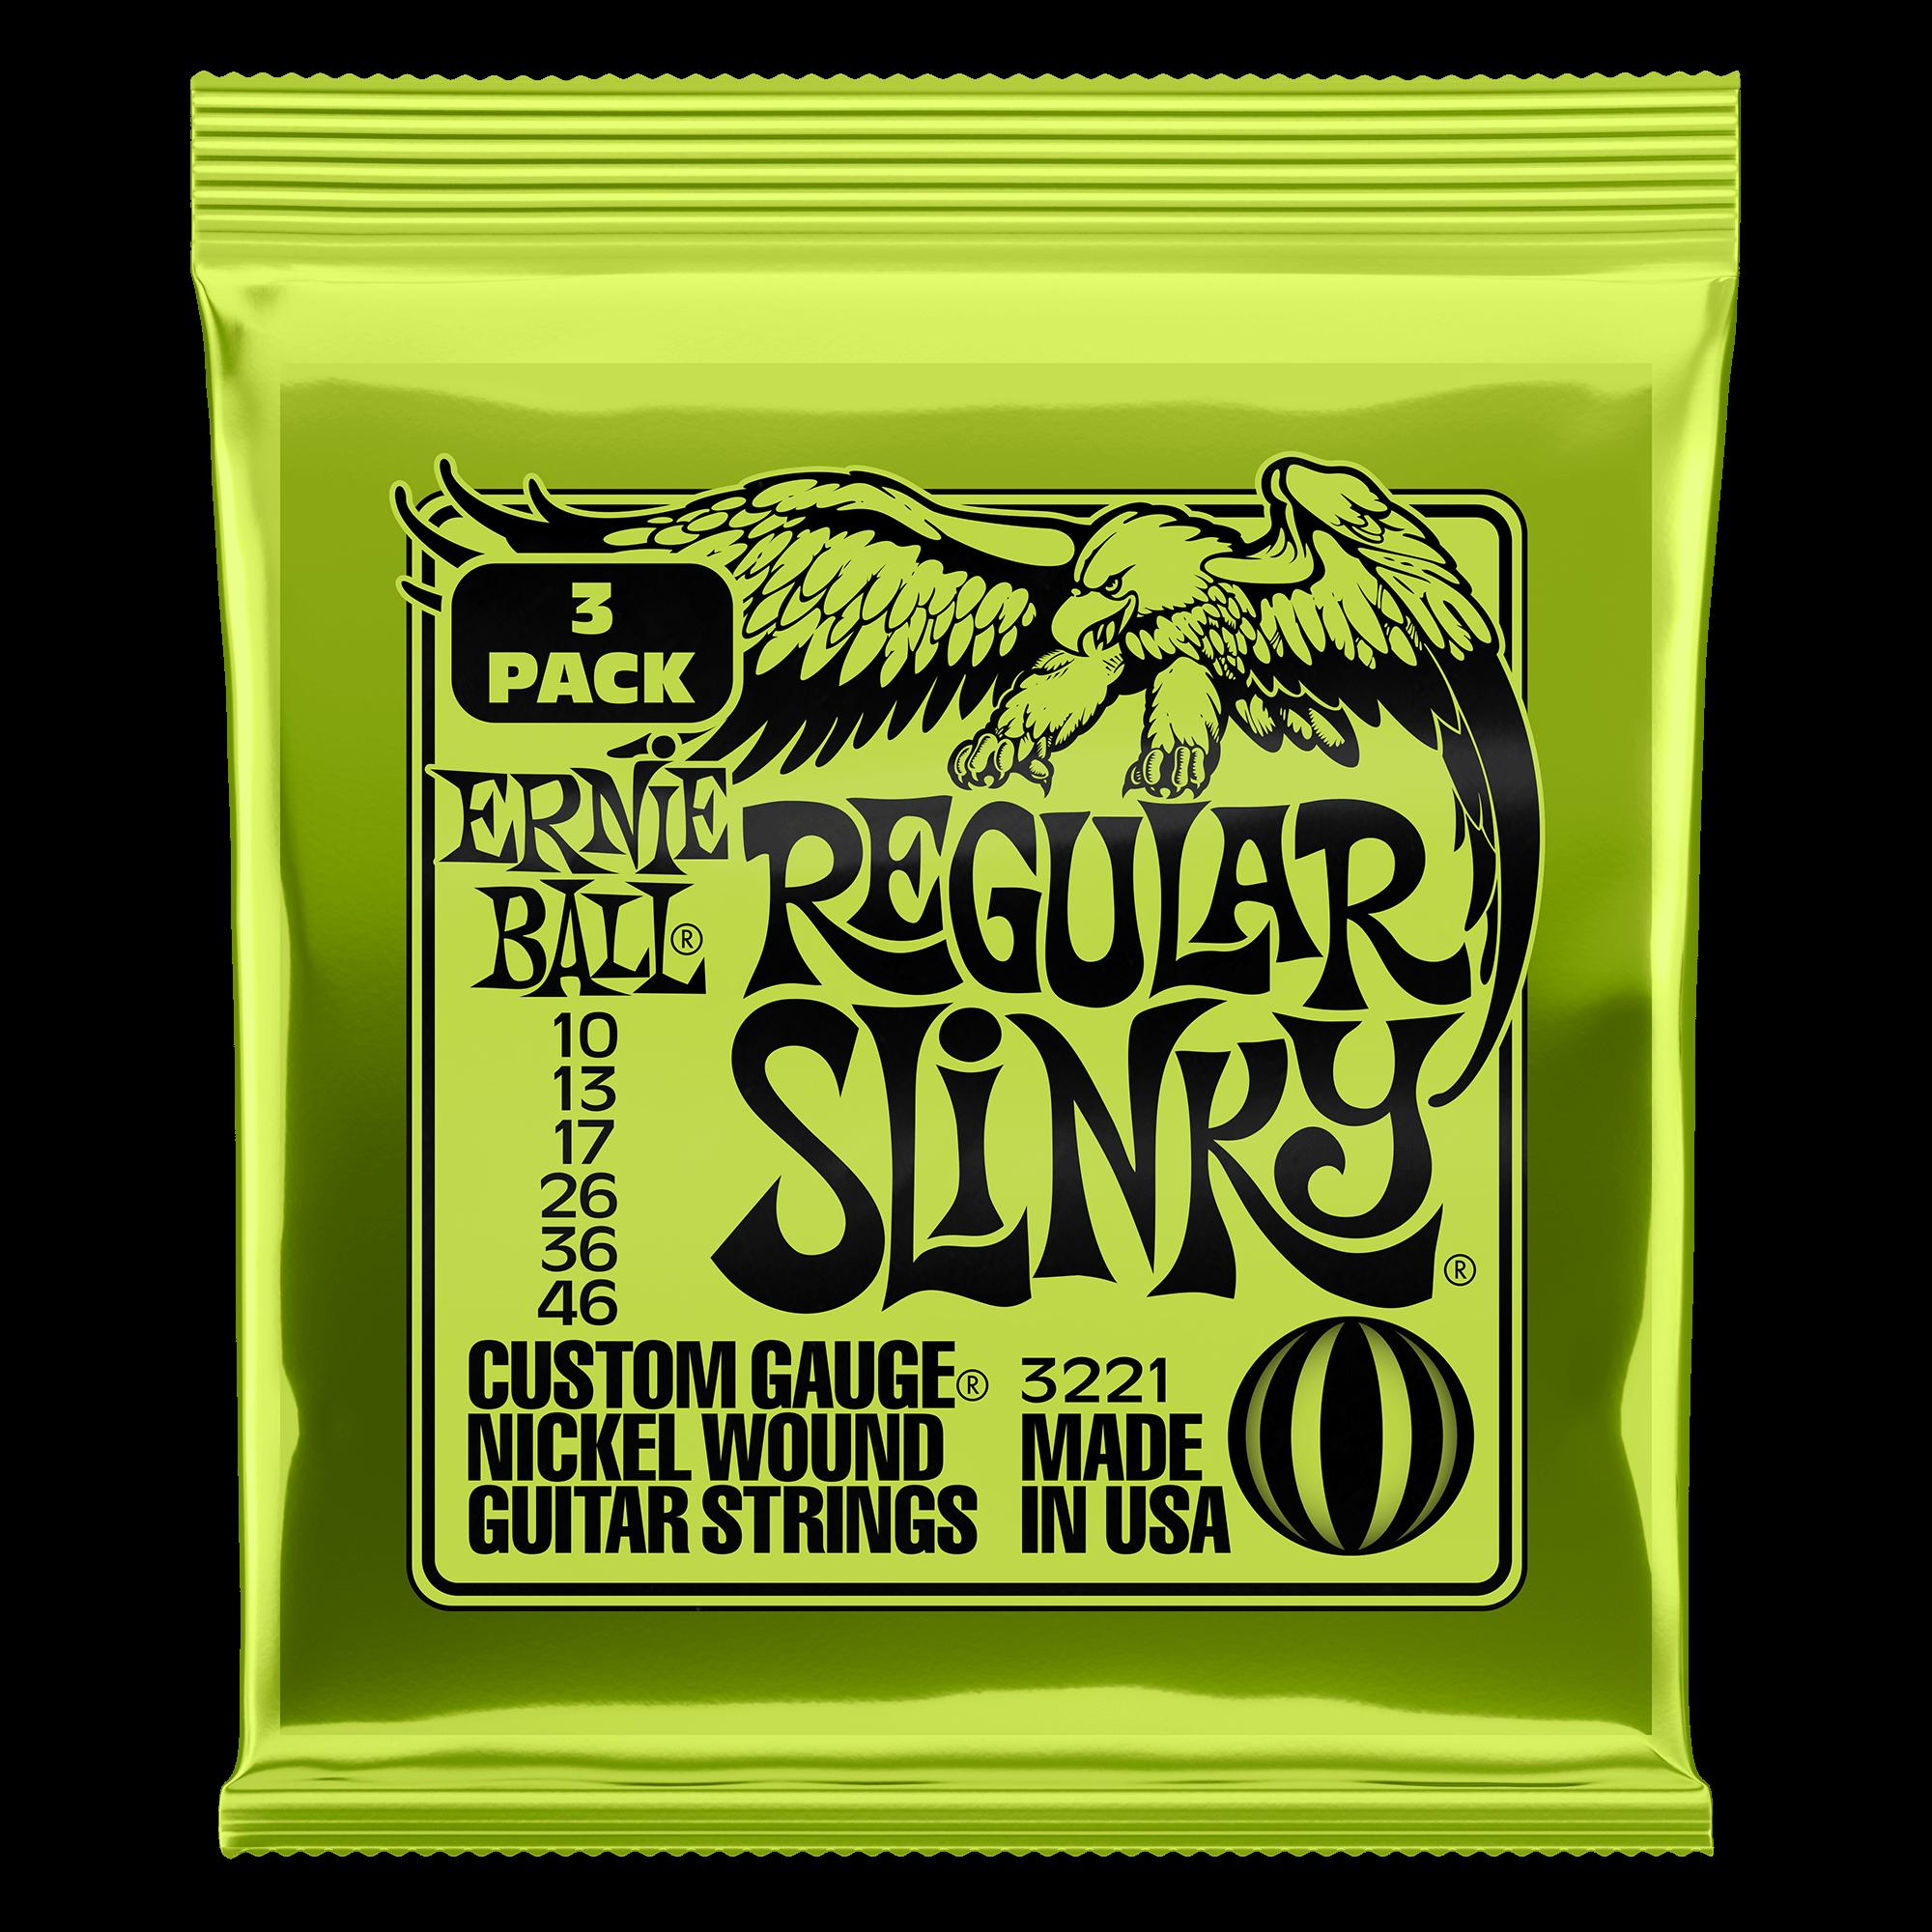 Slinky Nickel Wound E-Gitarren 6-Saiter | Ernie Ball